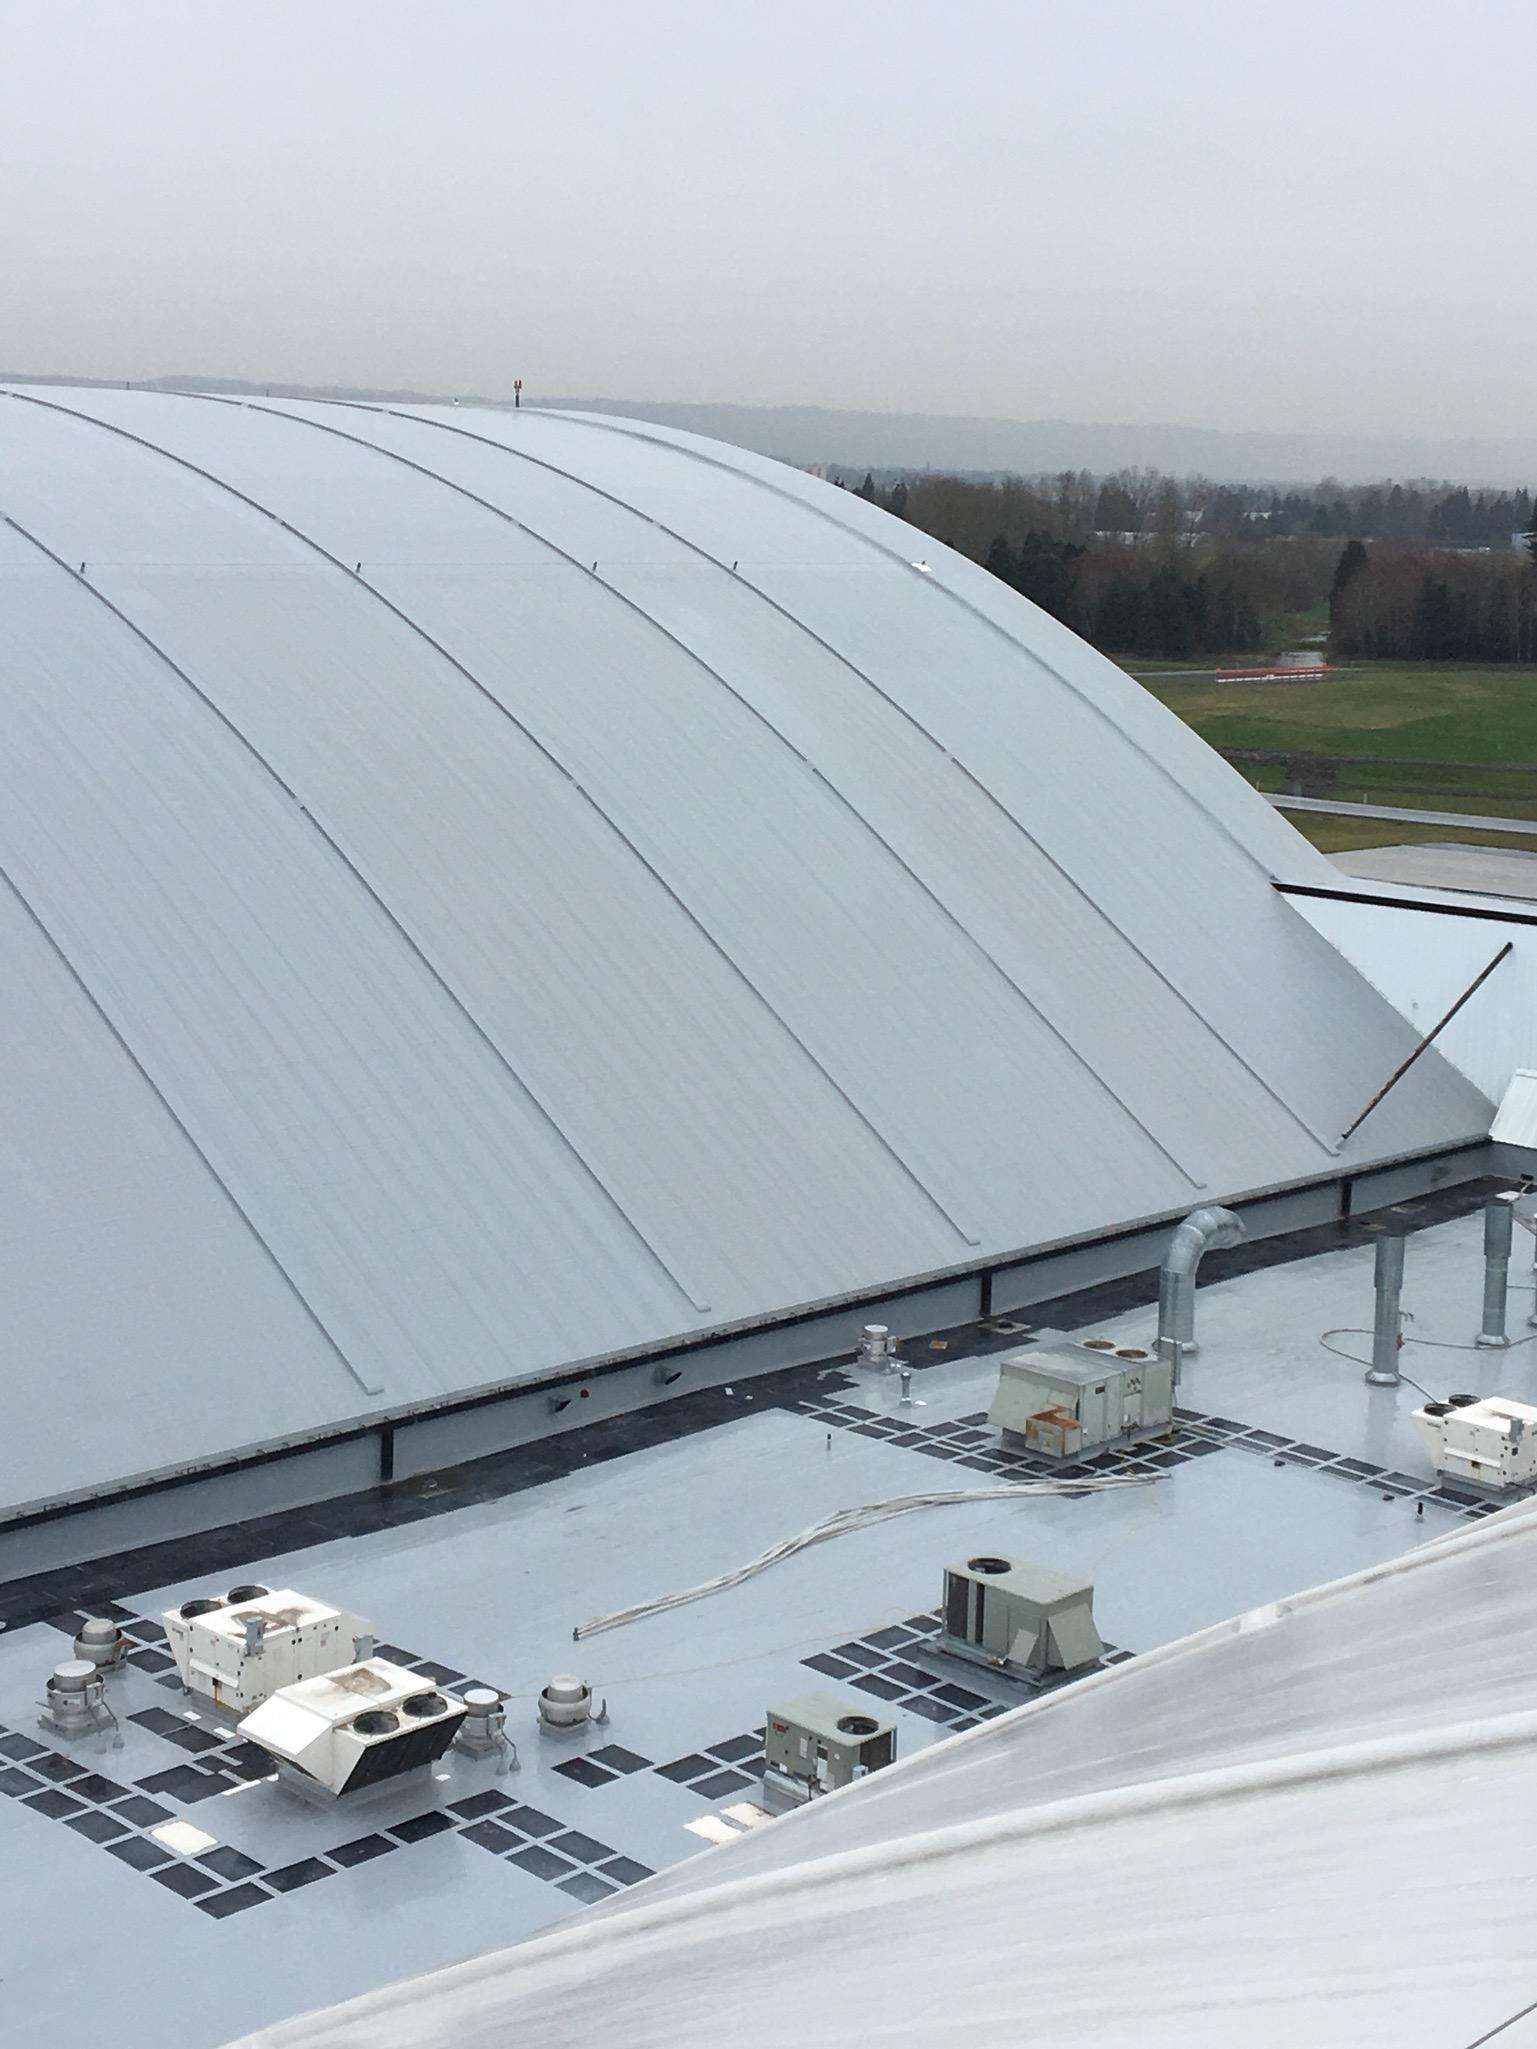 Horizontal lifeline on a barrel roof of a paint hangar for aerospace.